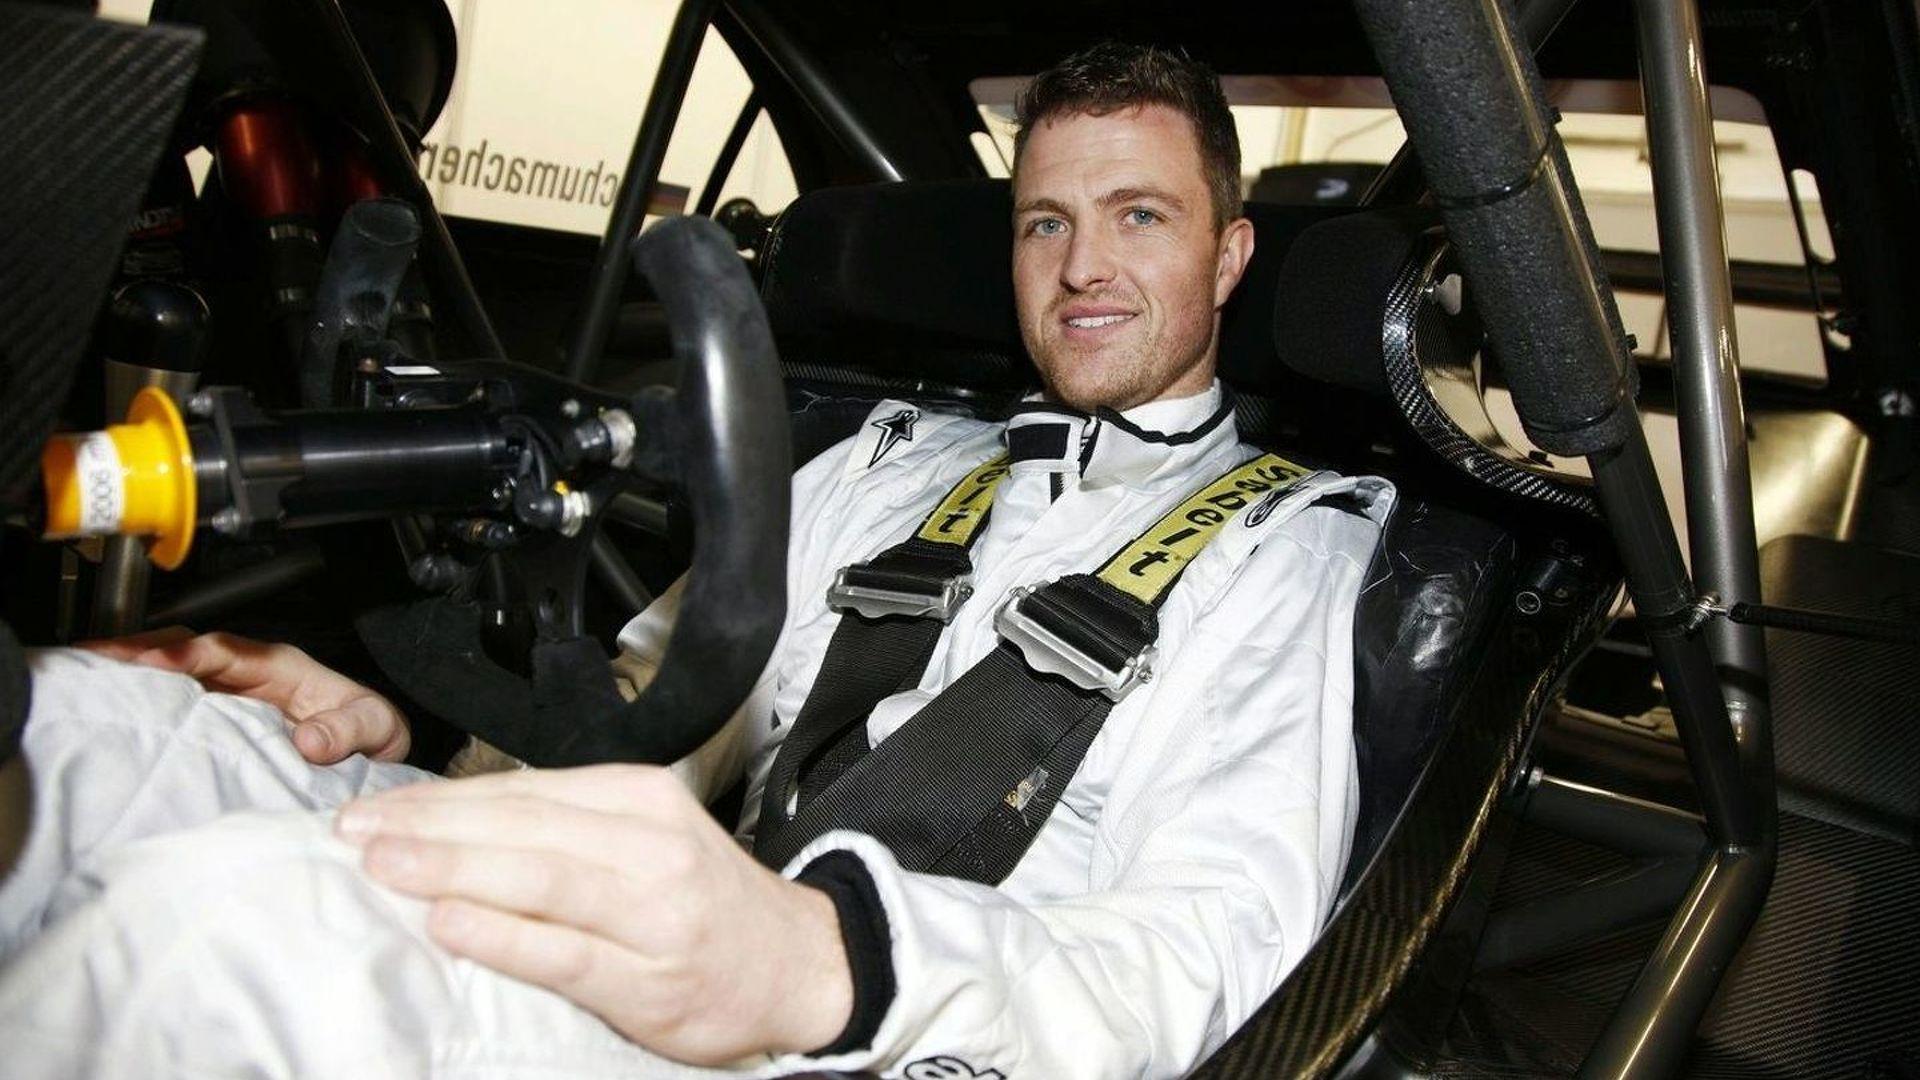 No role at Mercedes GP for Ralf Schumacher